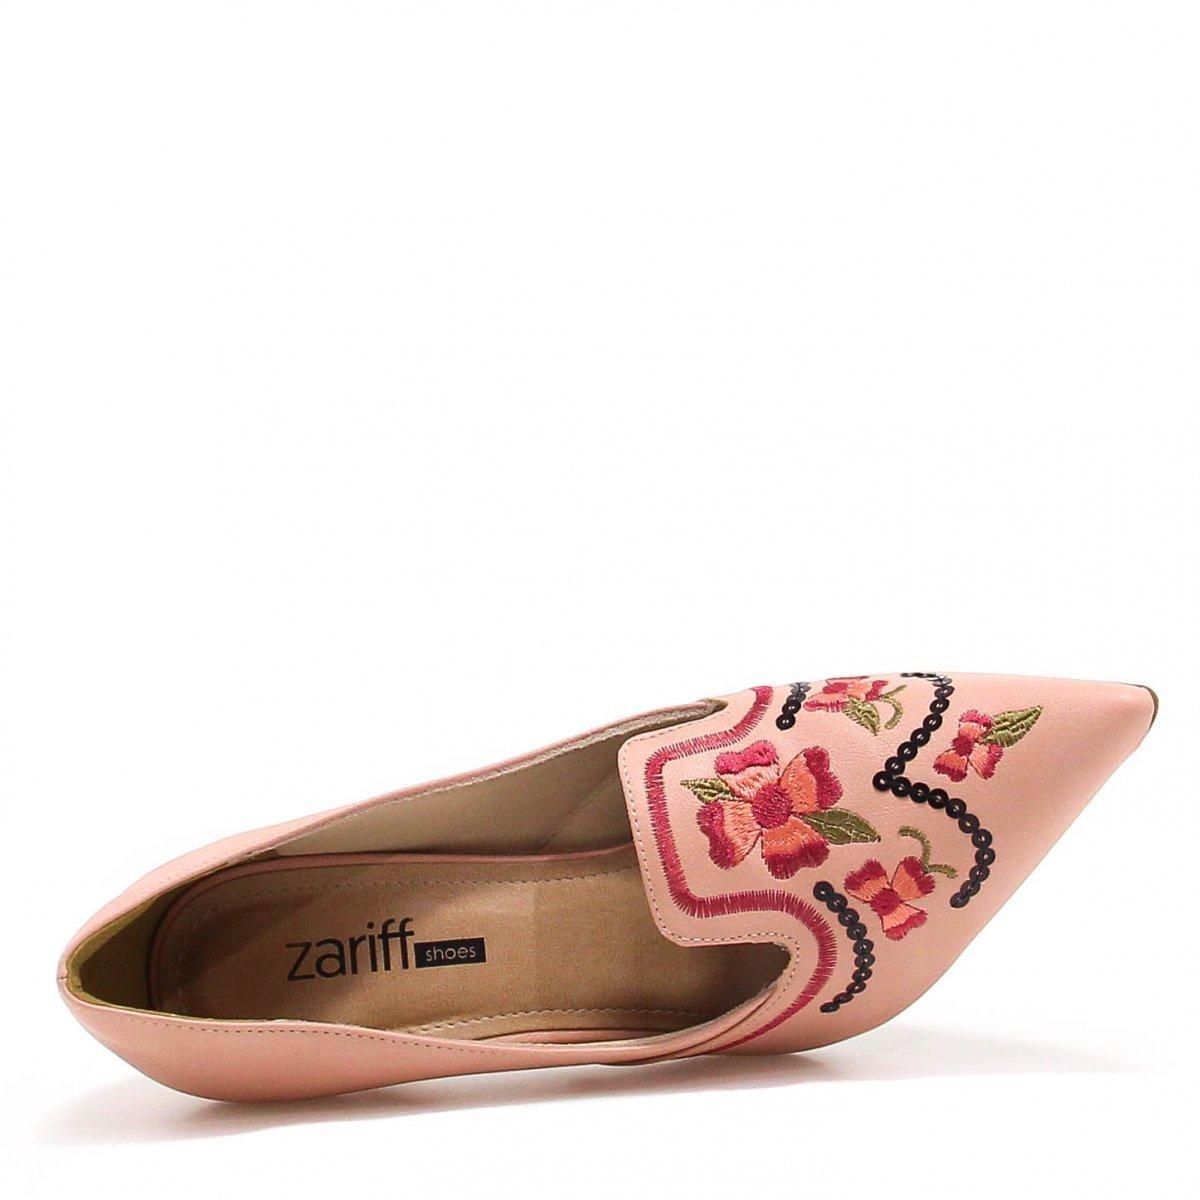 Sapato Zariff Shoes Scarpin Bordado - Nude